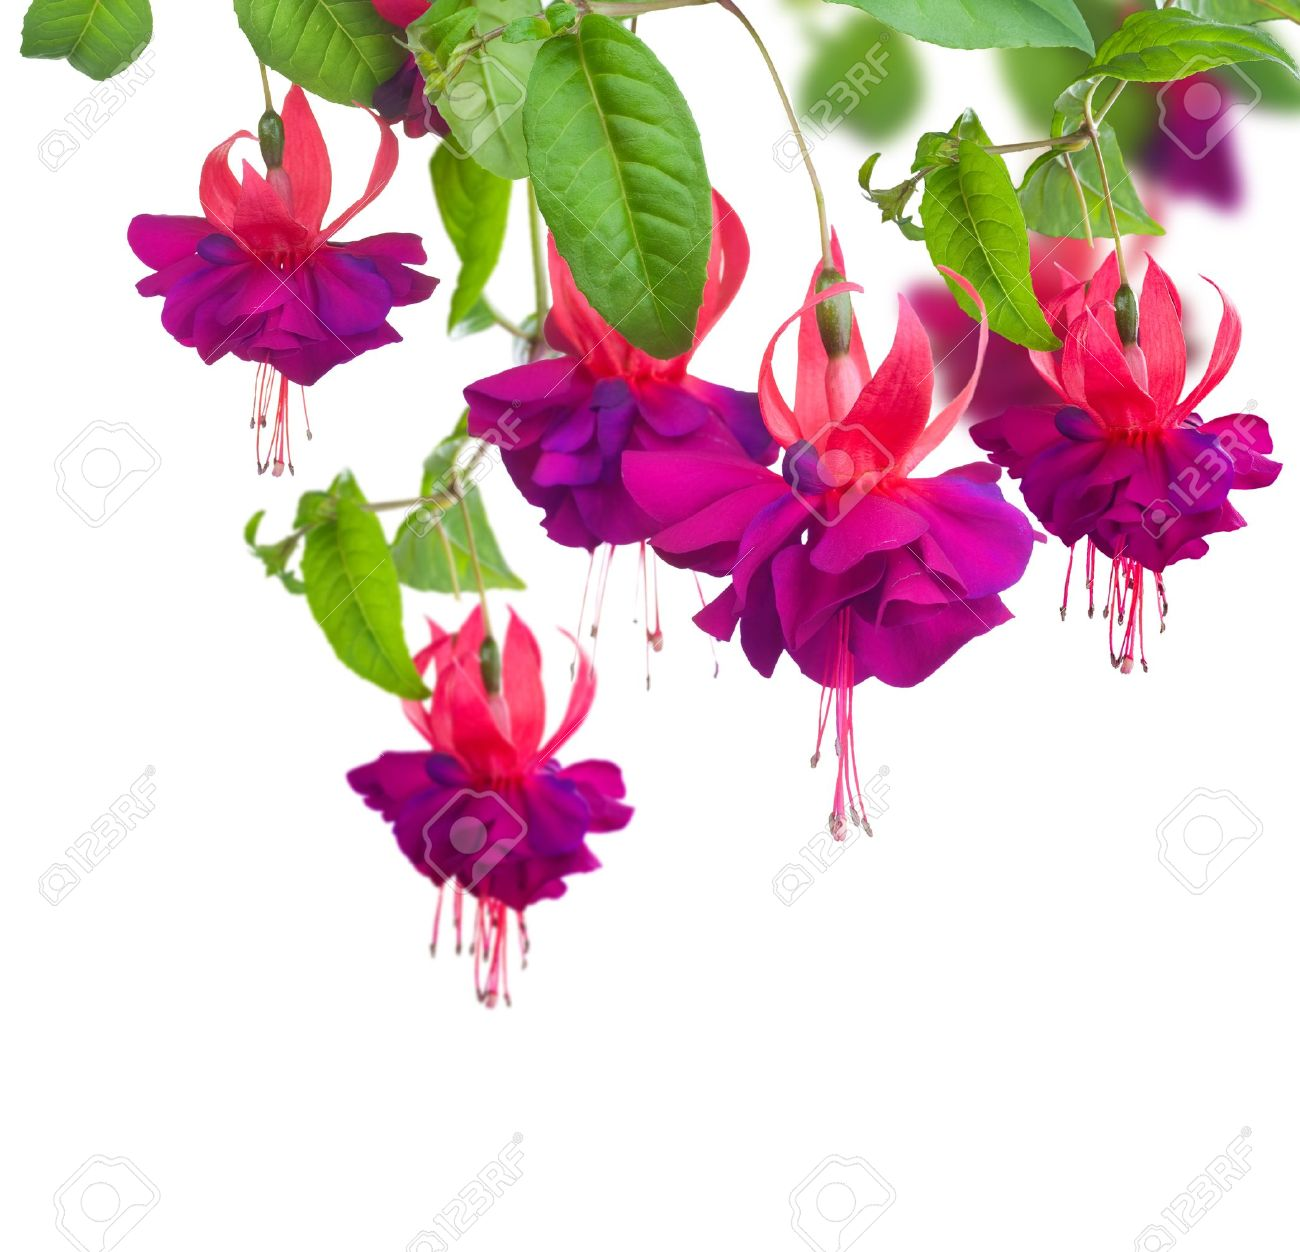 Fuchsia flowers Stock Photo - 9722601